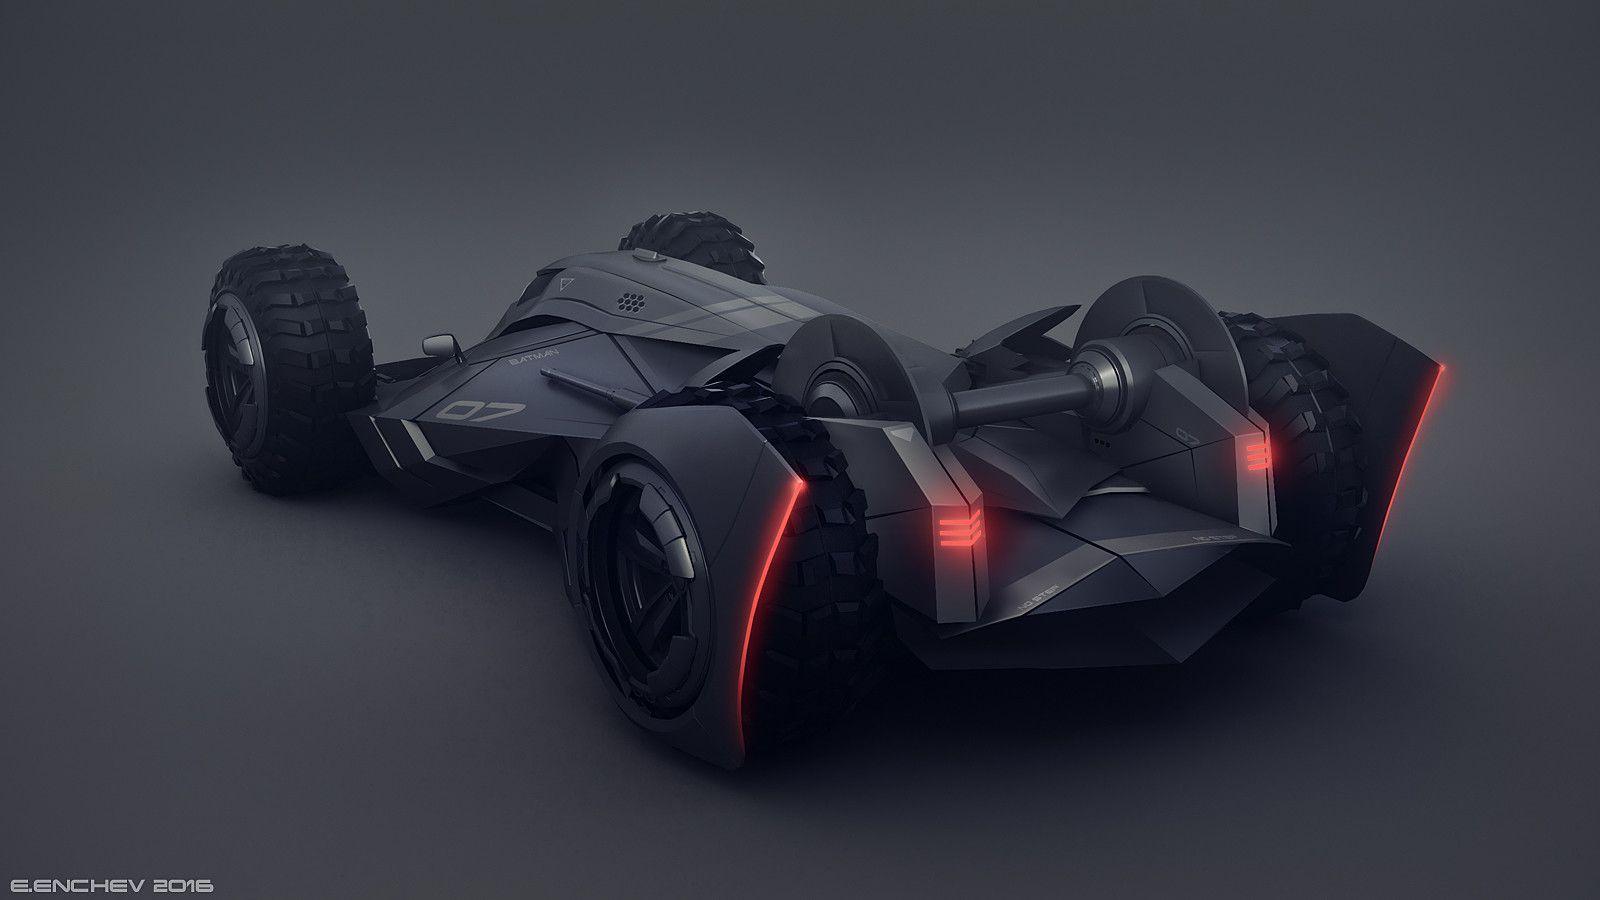 Batmobile Concept Part Encho Enchev On ArtStation At Https - Brand new batmobile revealed awesome